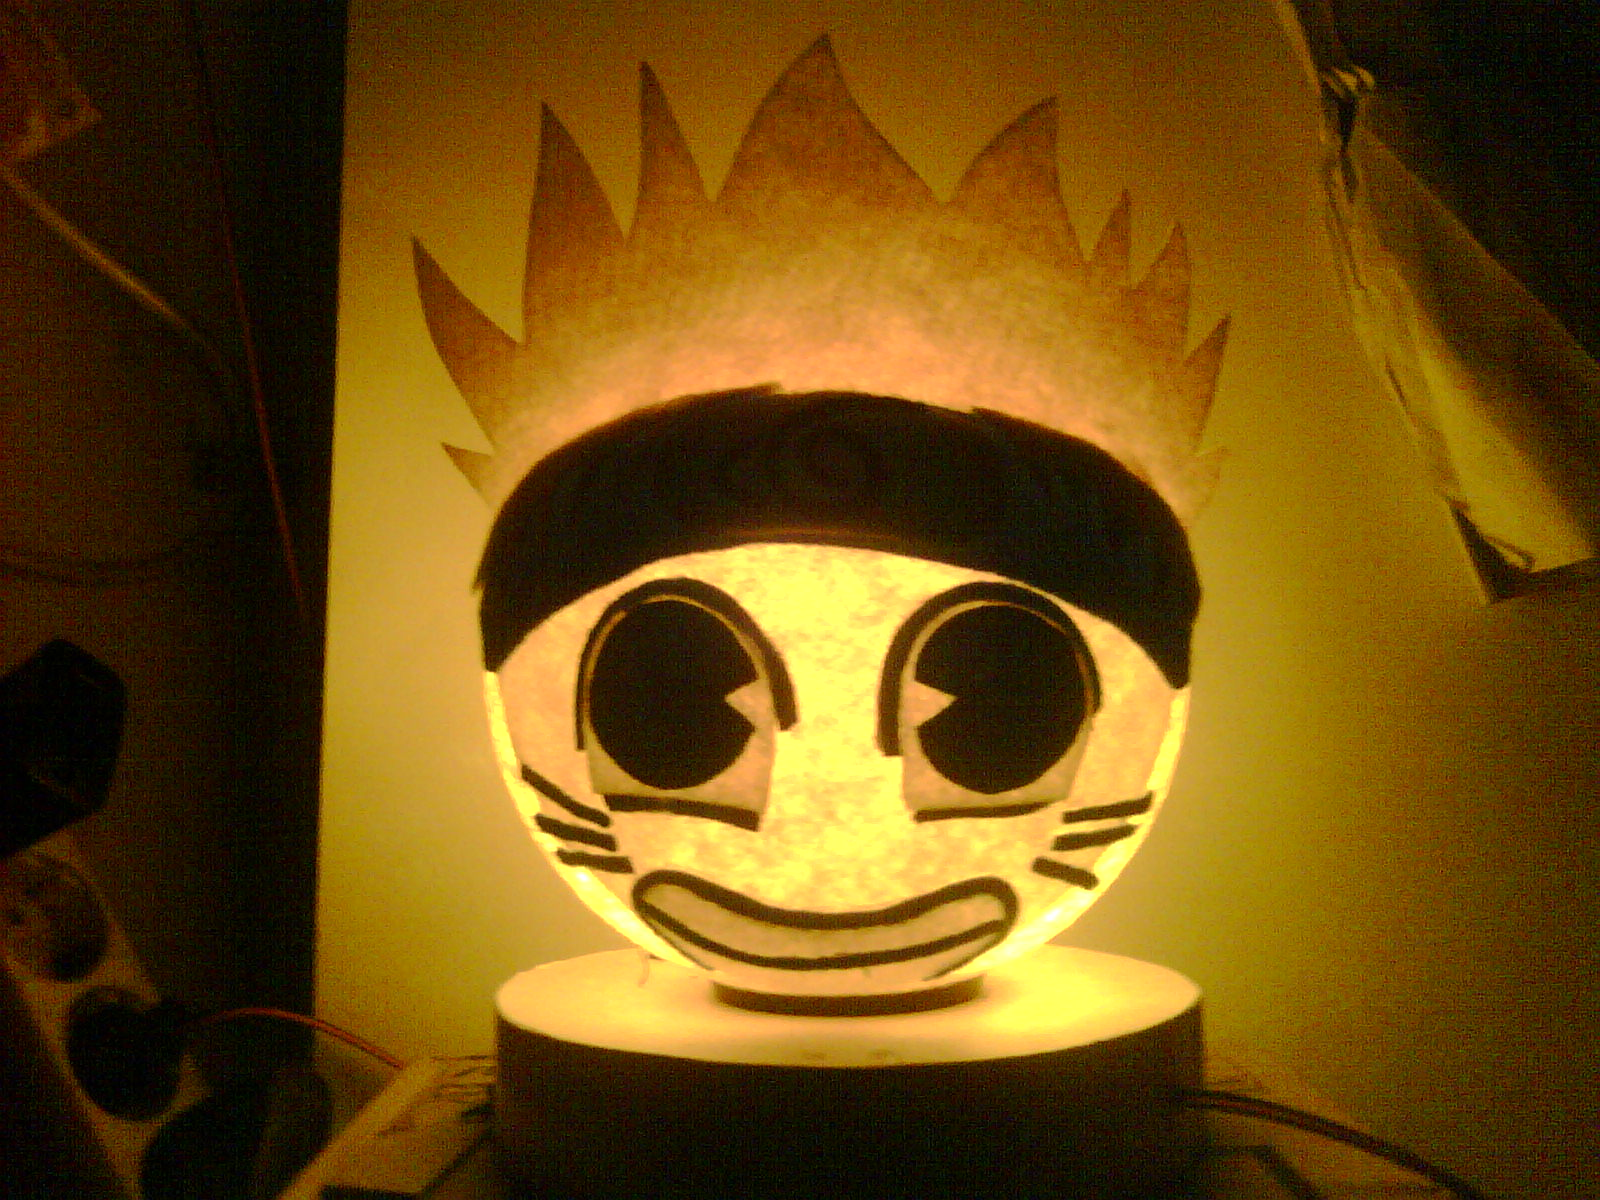 LAMPION - JUAL LAMPION - LAMPU KARAKTER - LAMPION TERBANG